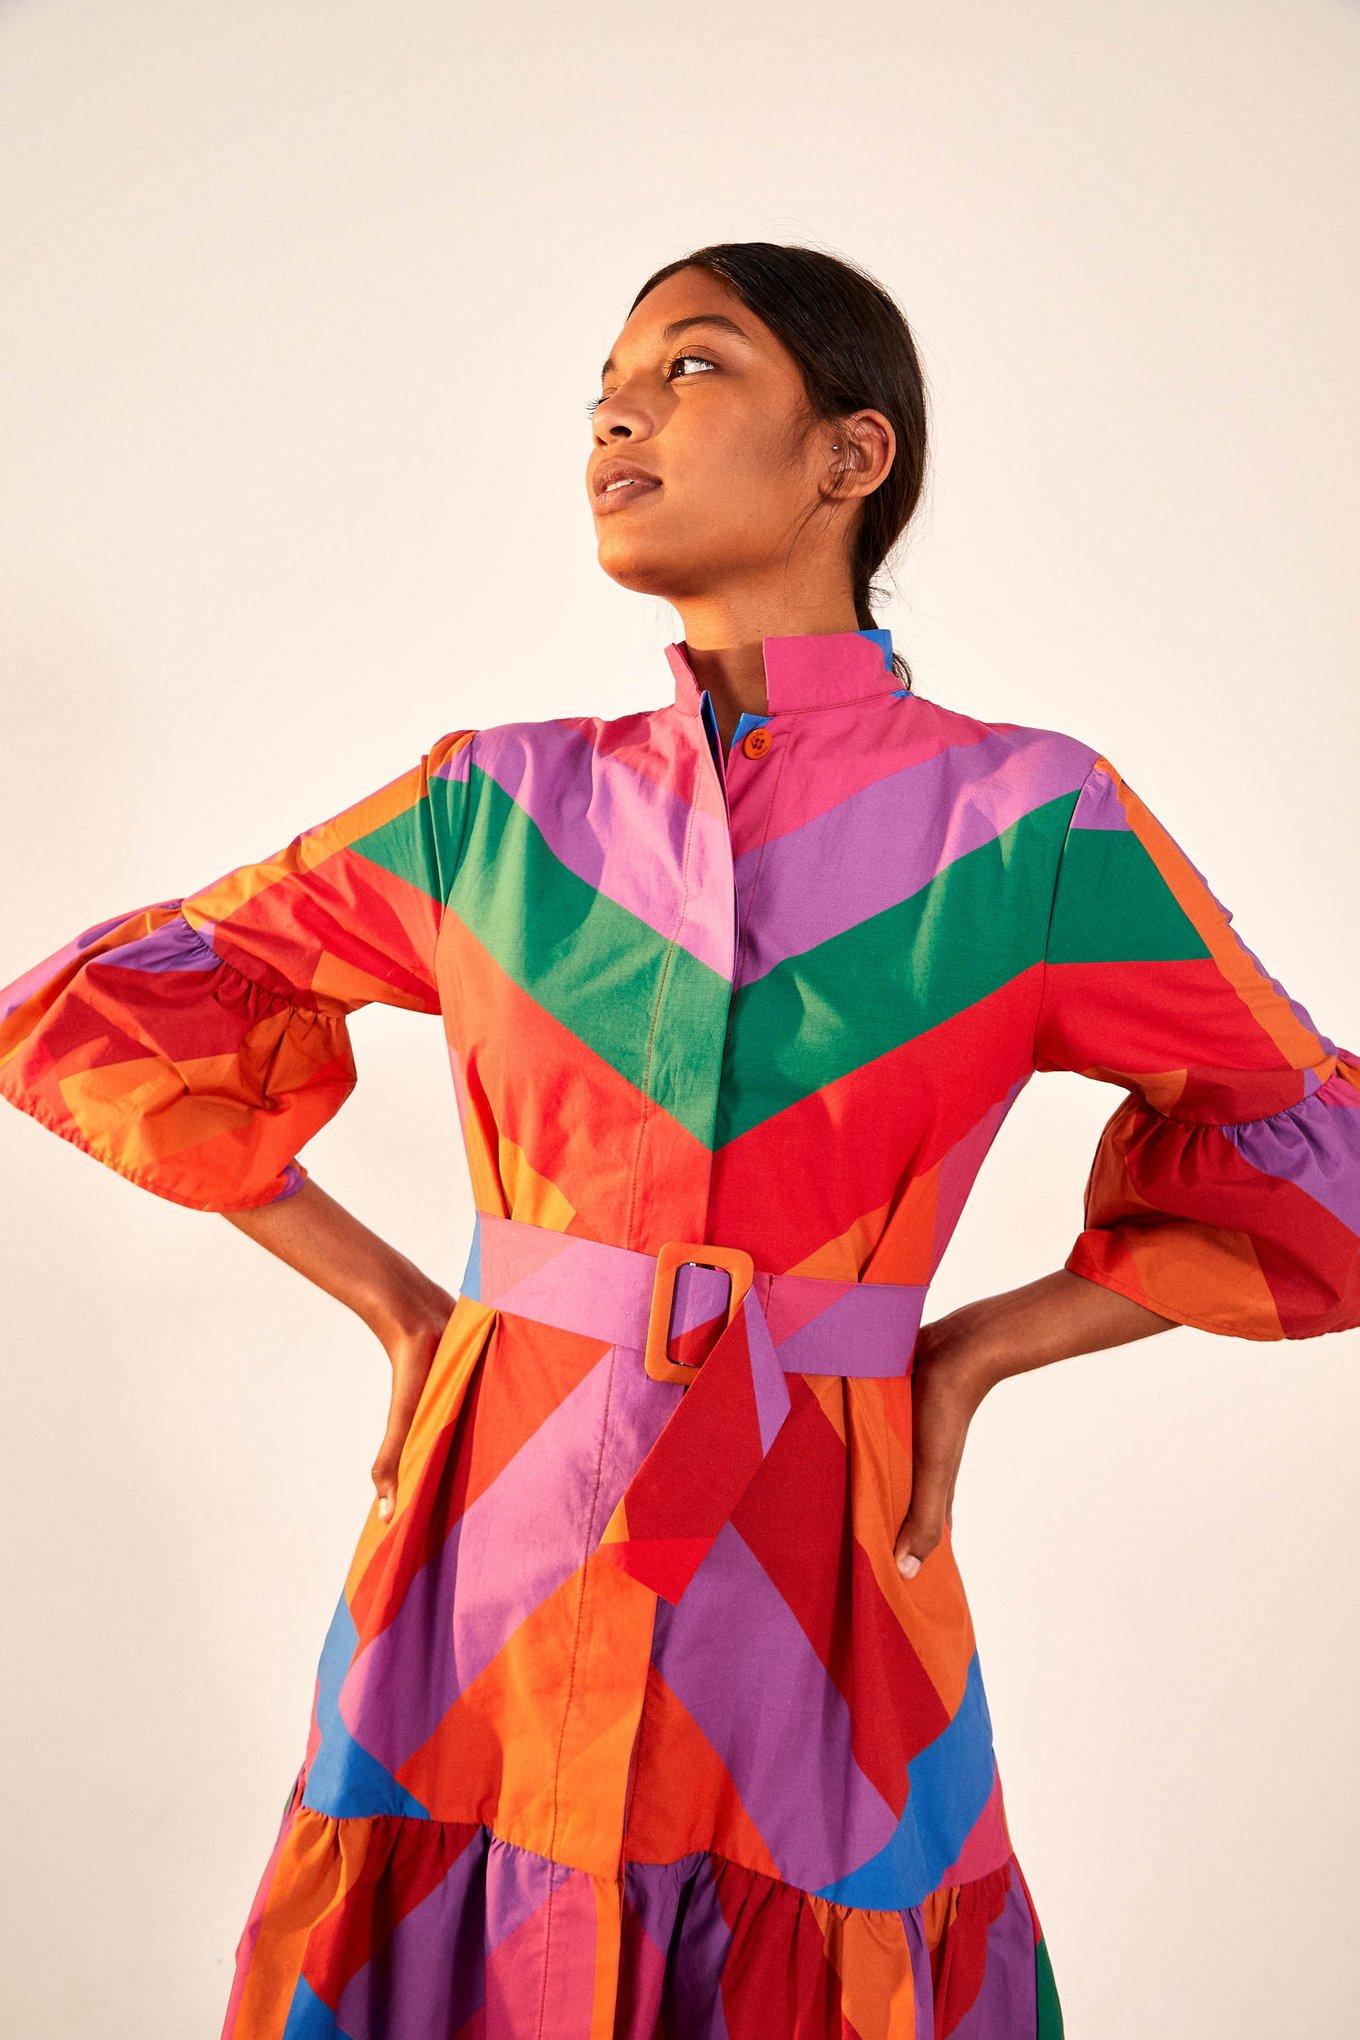 Amanda Stripes Mini Dress $124